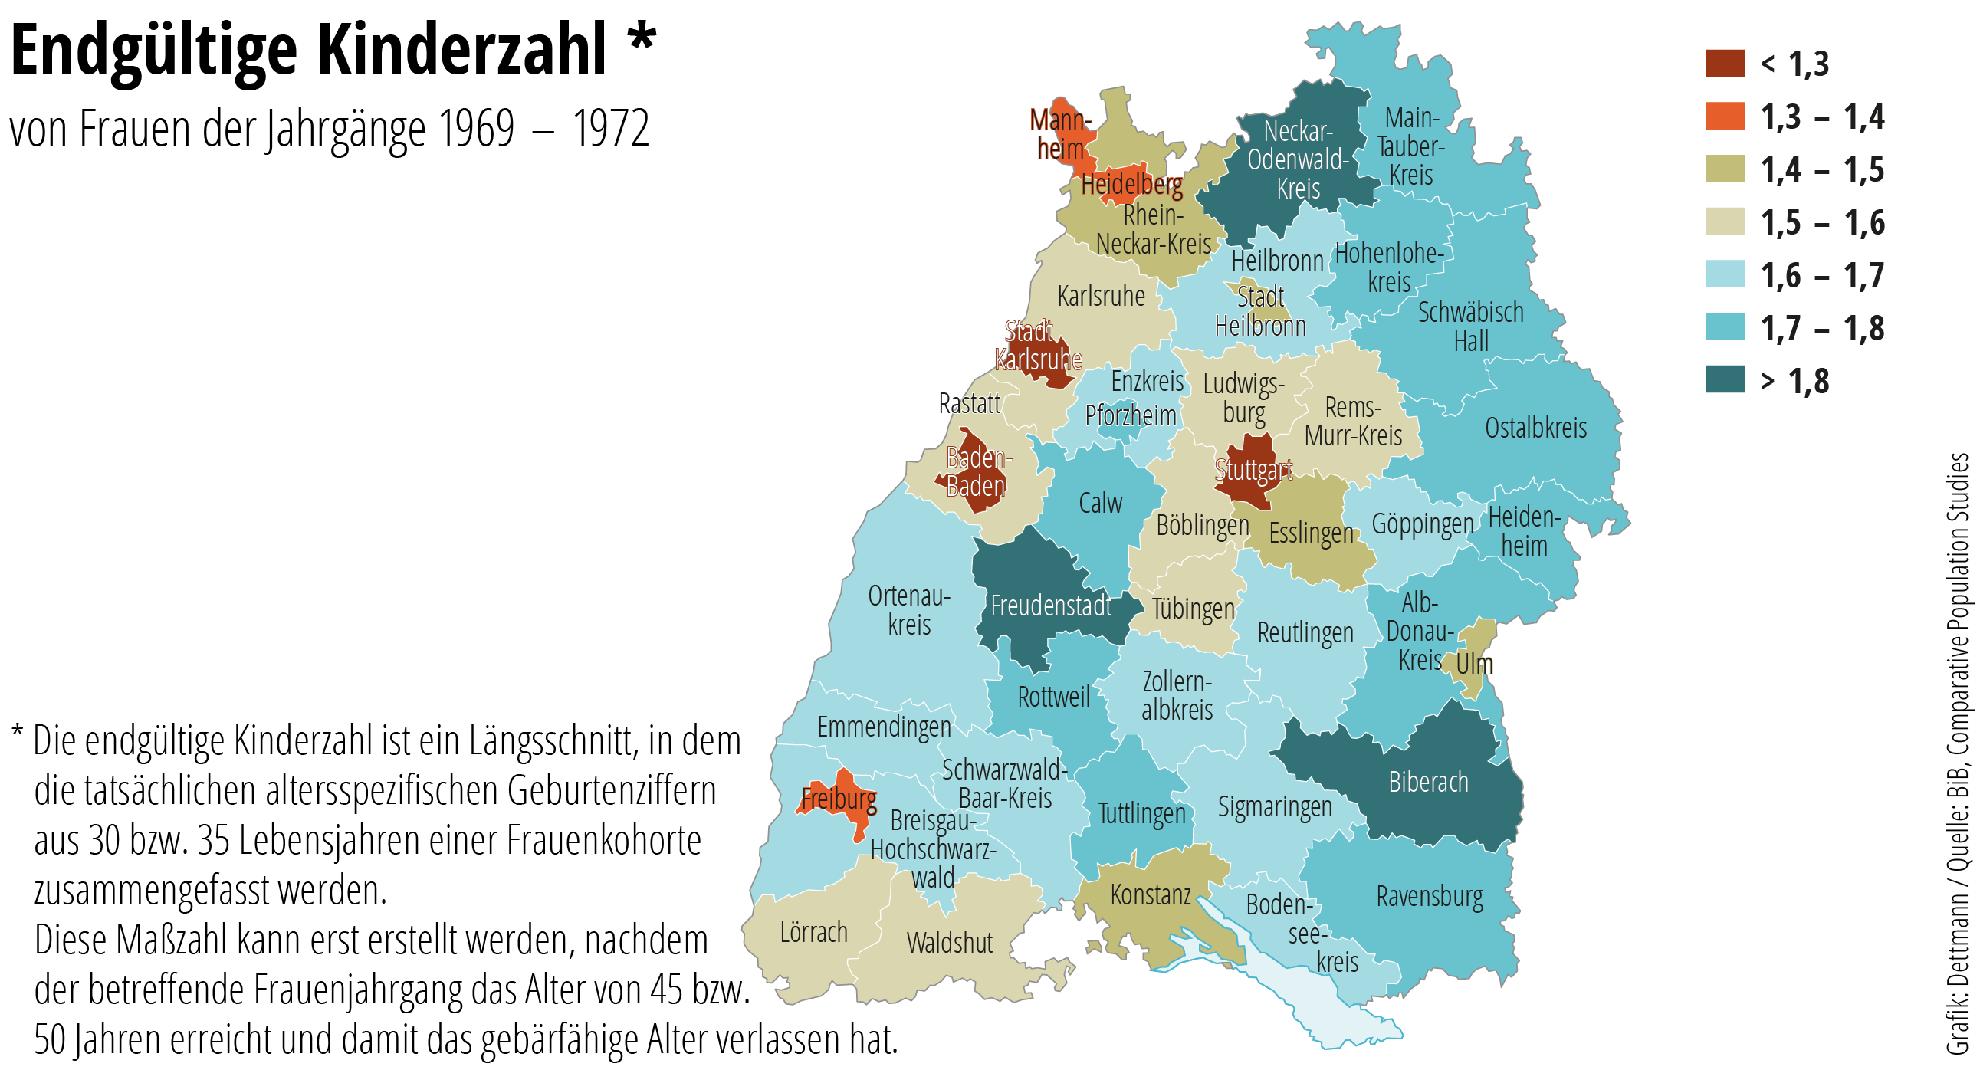 Großstädte Baden-Württemberg